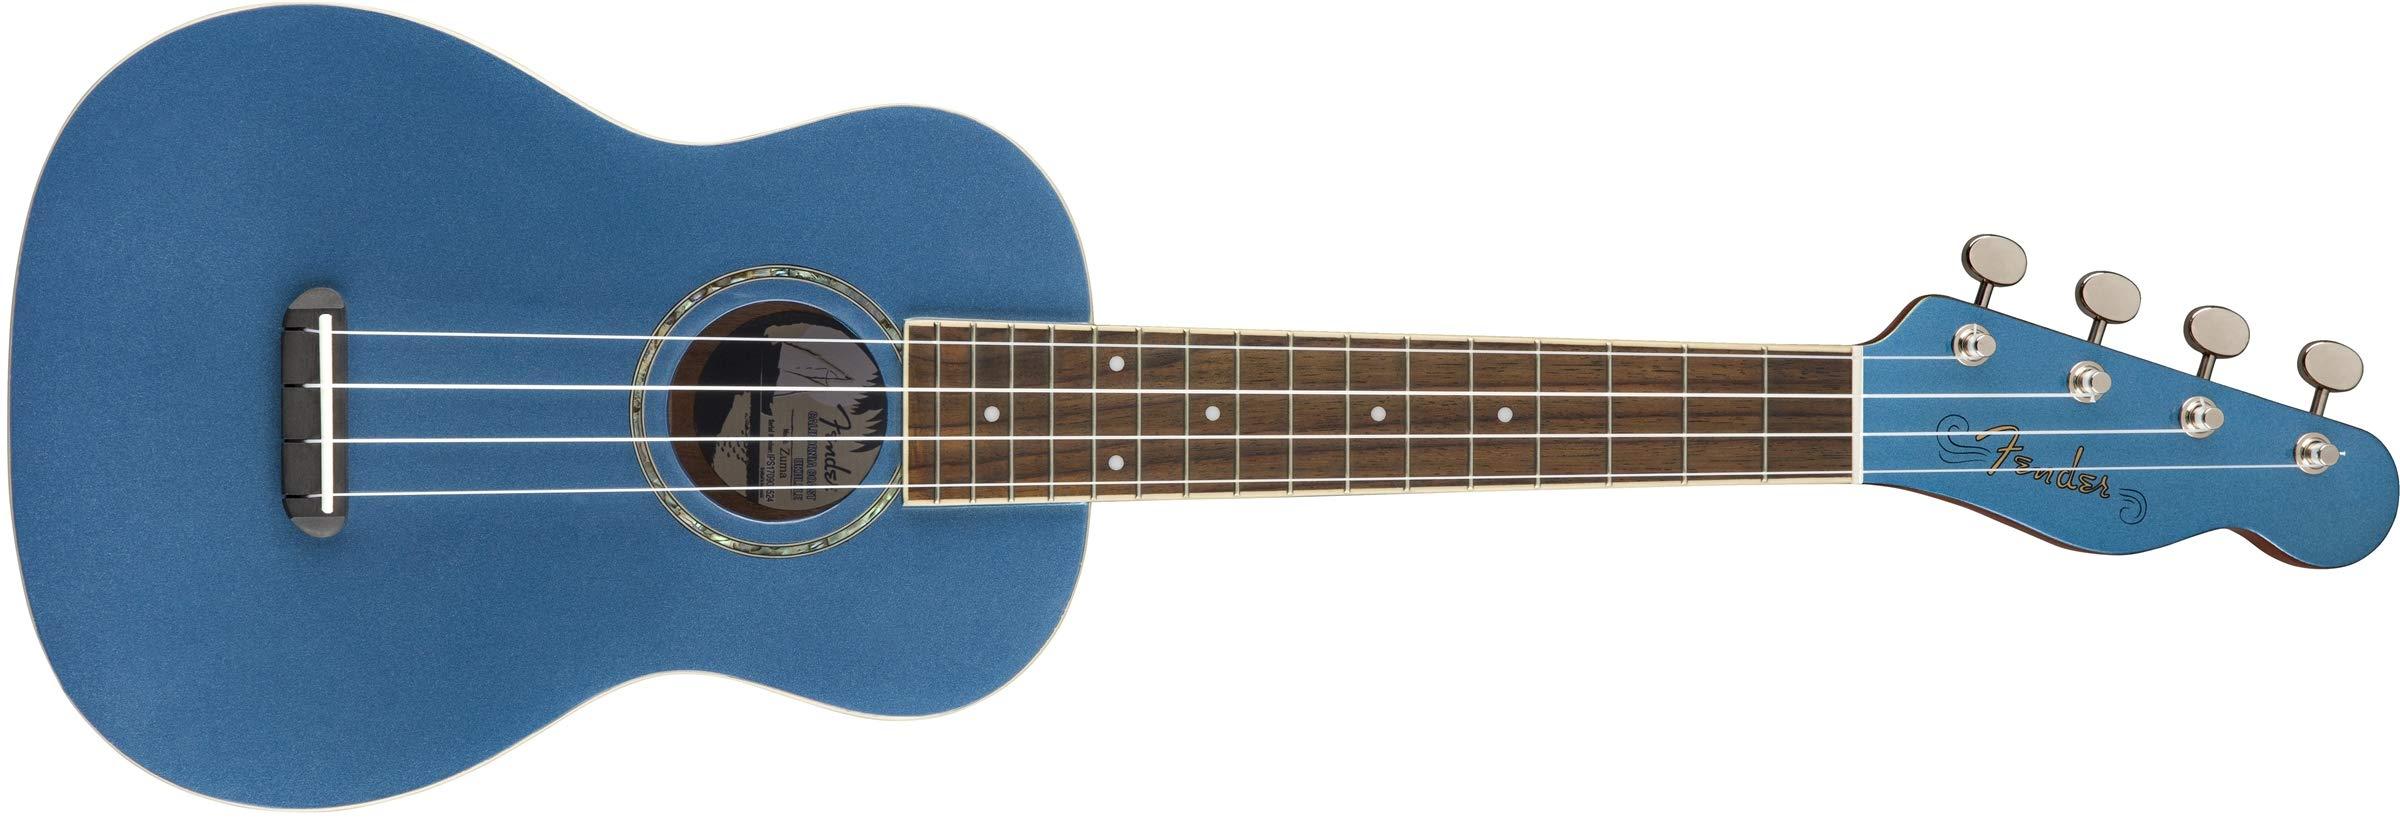 Fender Zuma Concert Uke, Walnut Fingerboard, Lake Placid Blue